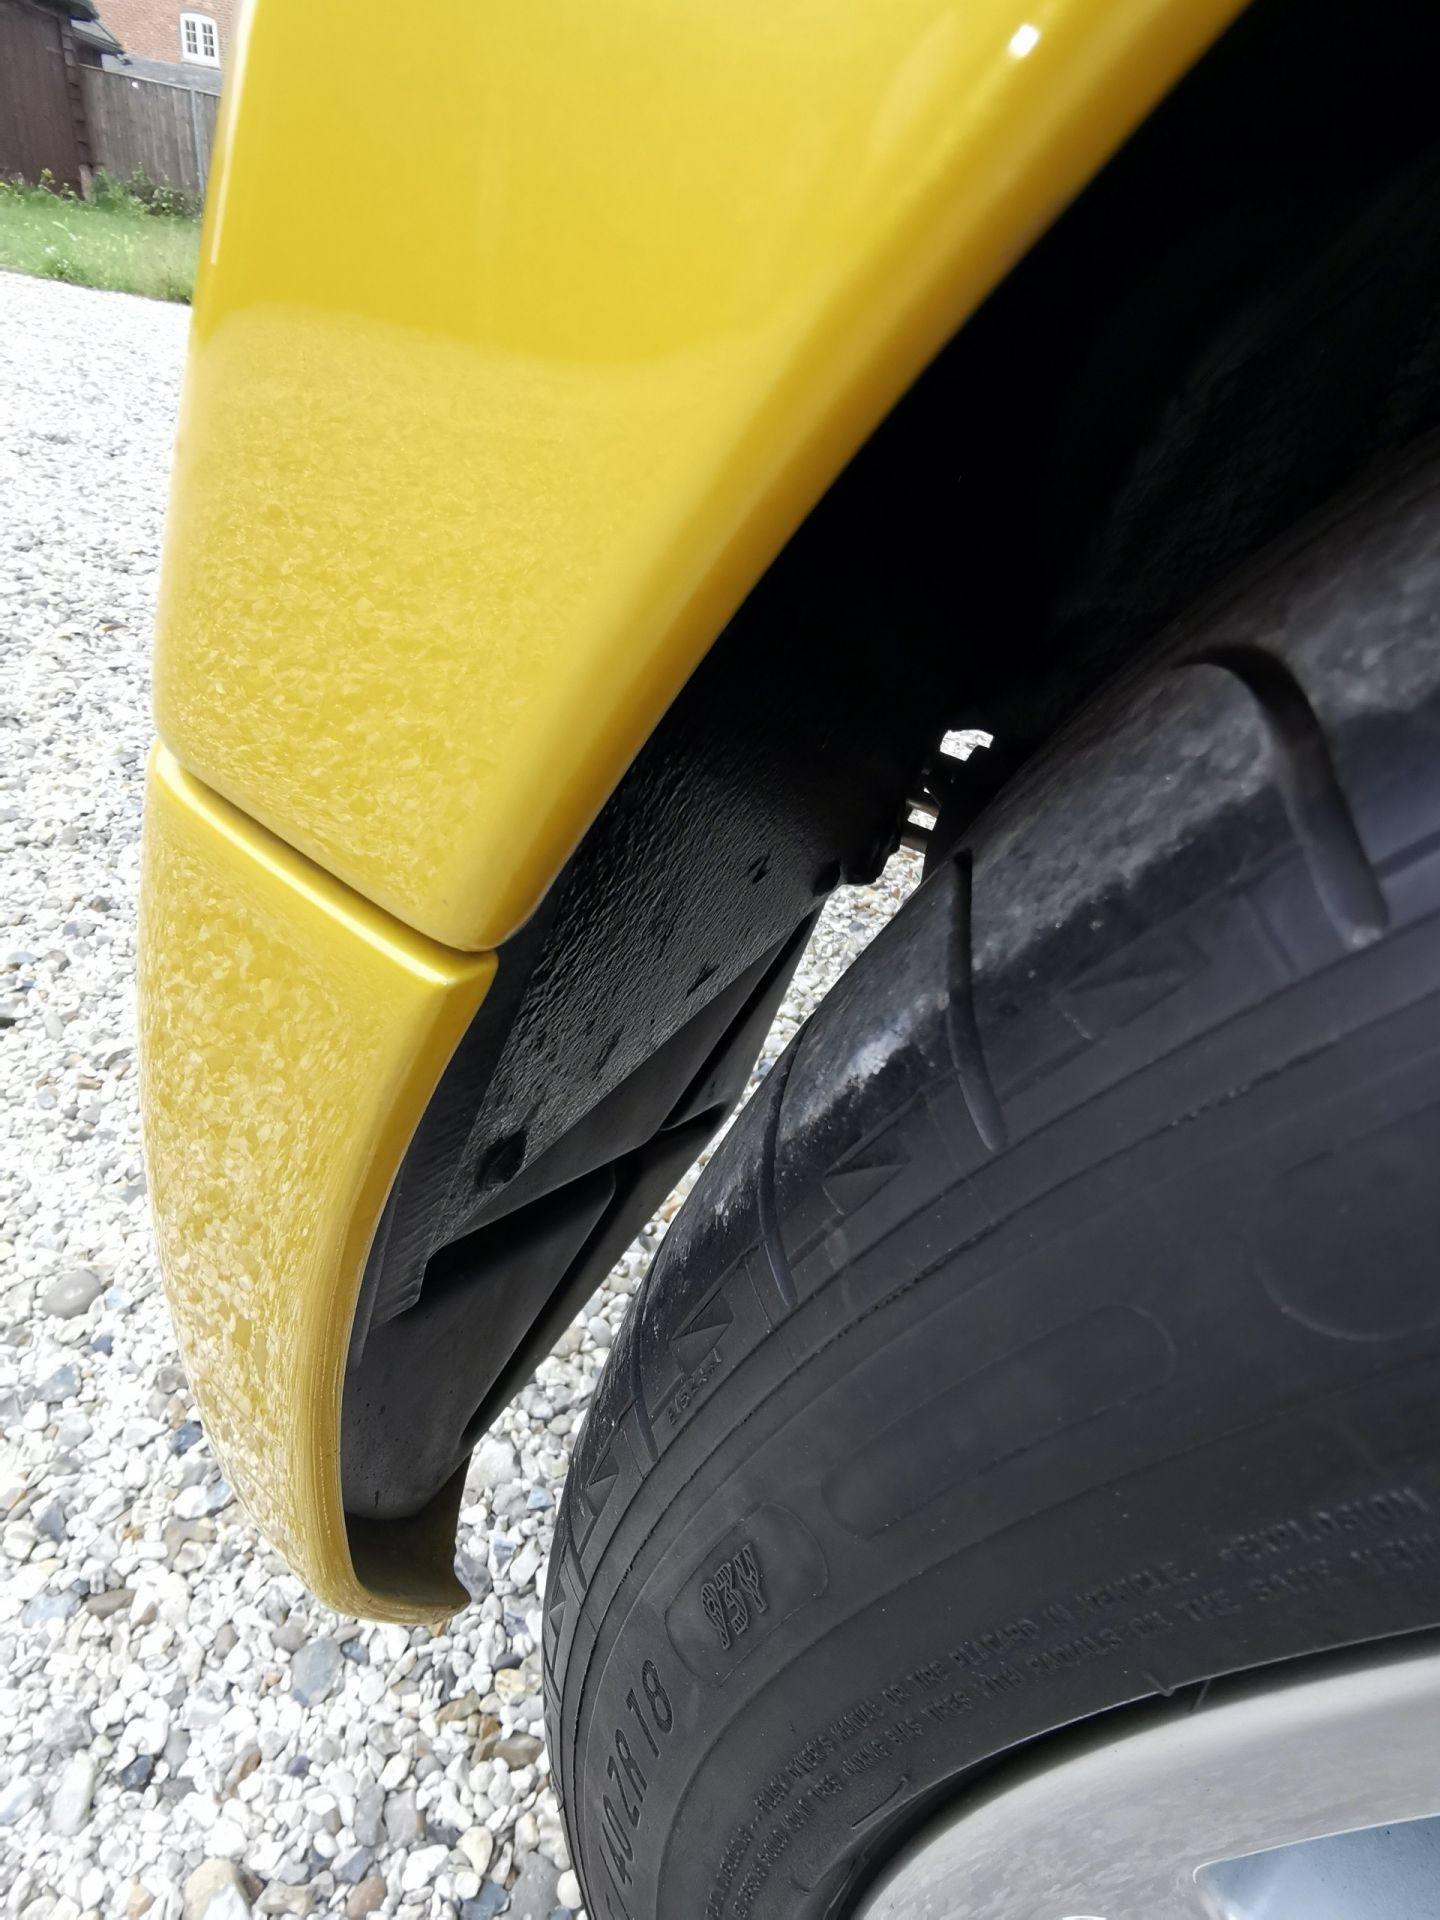 2005_Renault_Clio_V6_Phase_2_0167